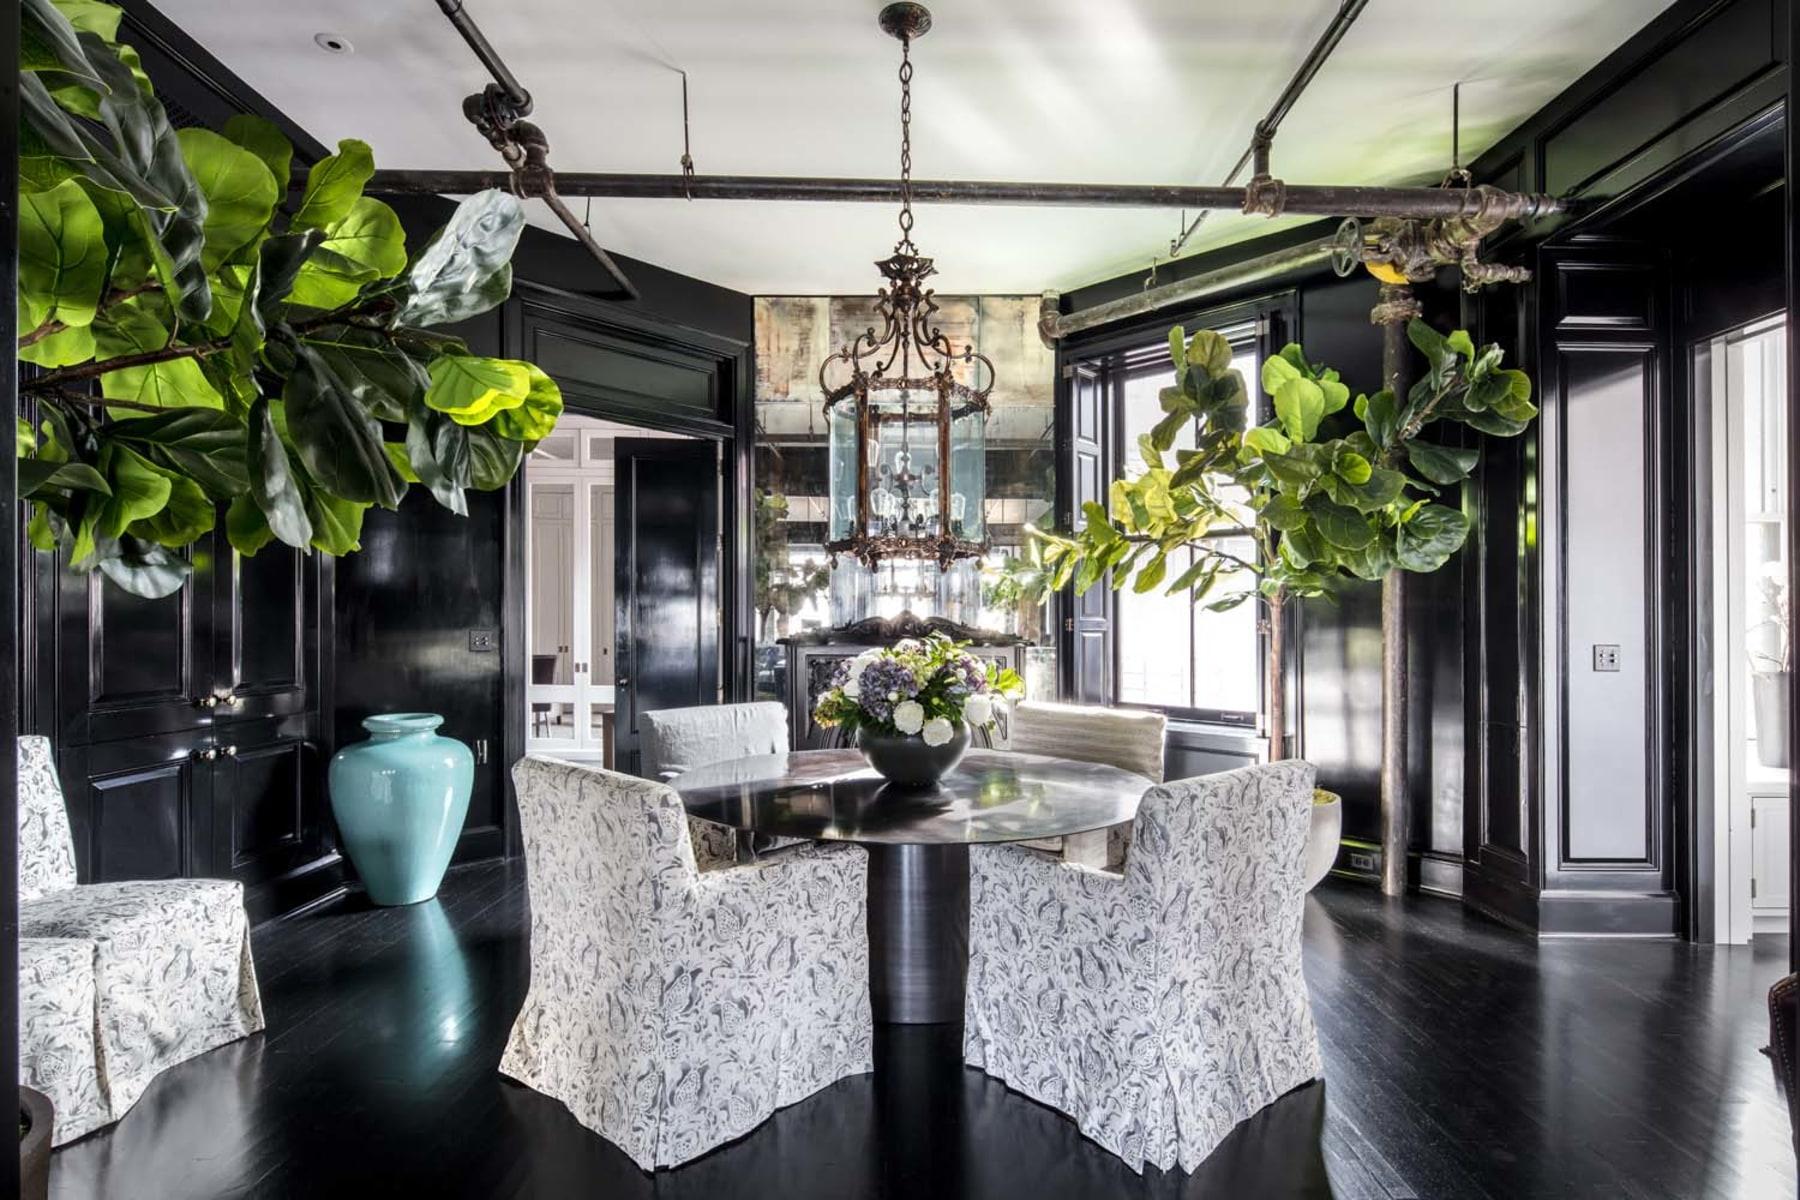 See inside Taraji P. Henson's $2.675 listed LA home ...